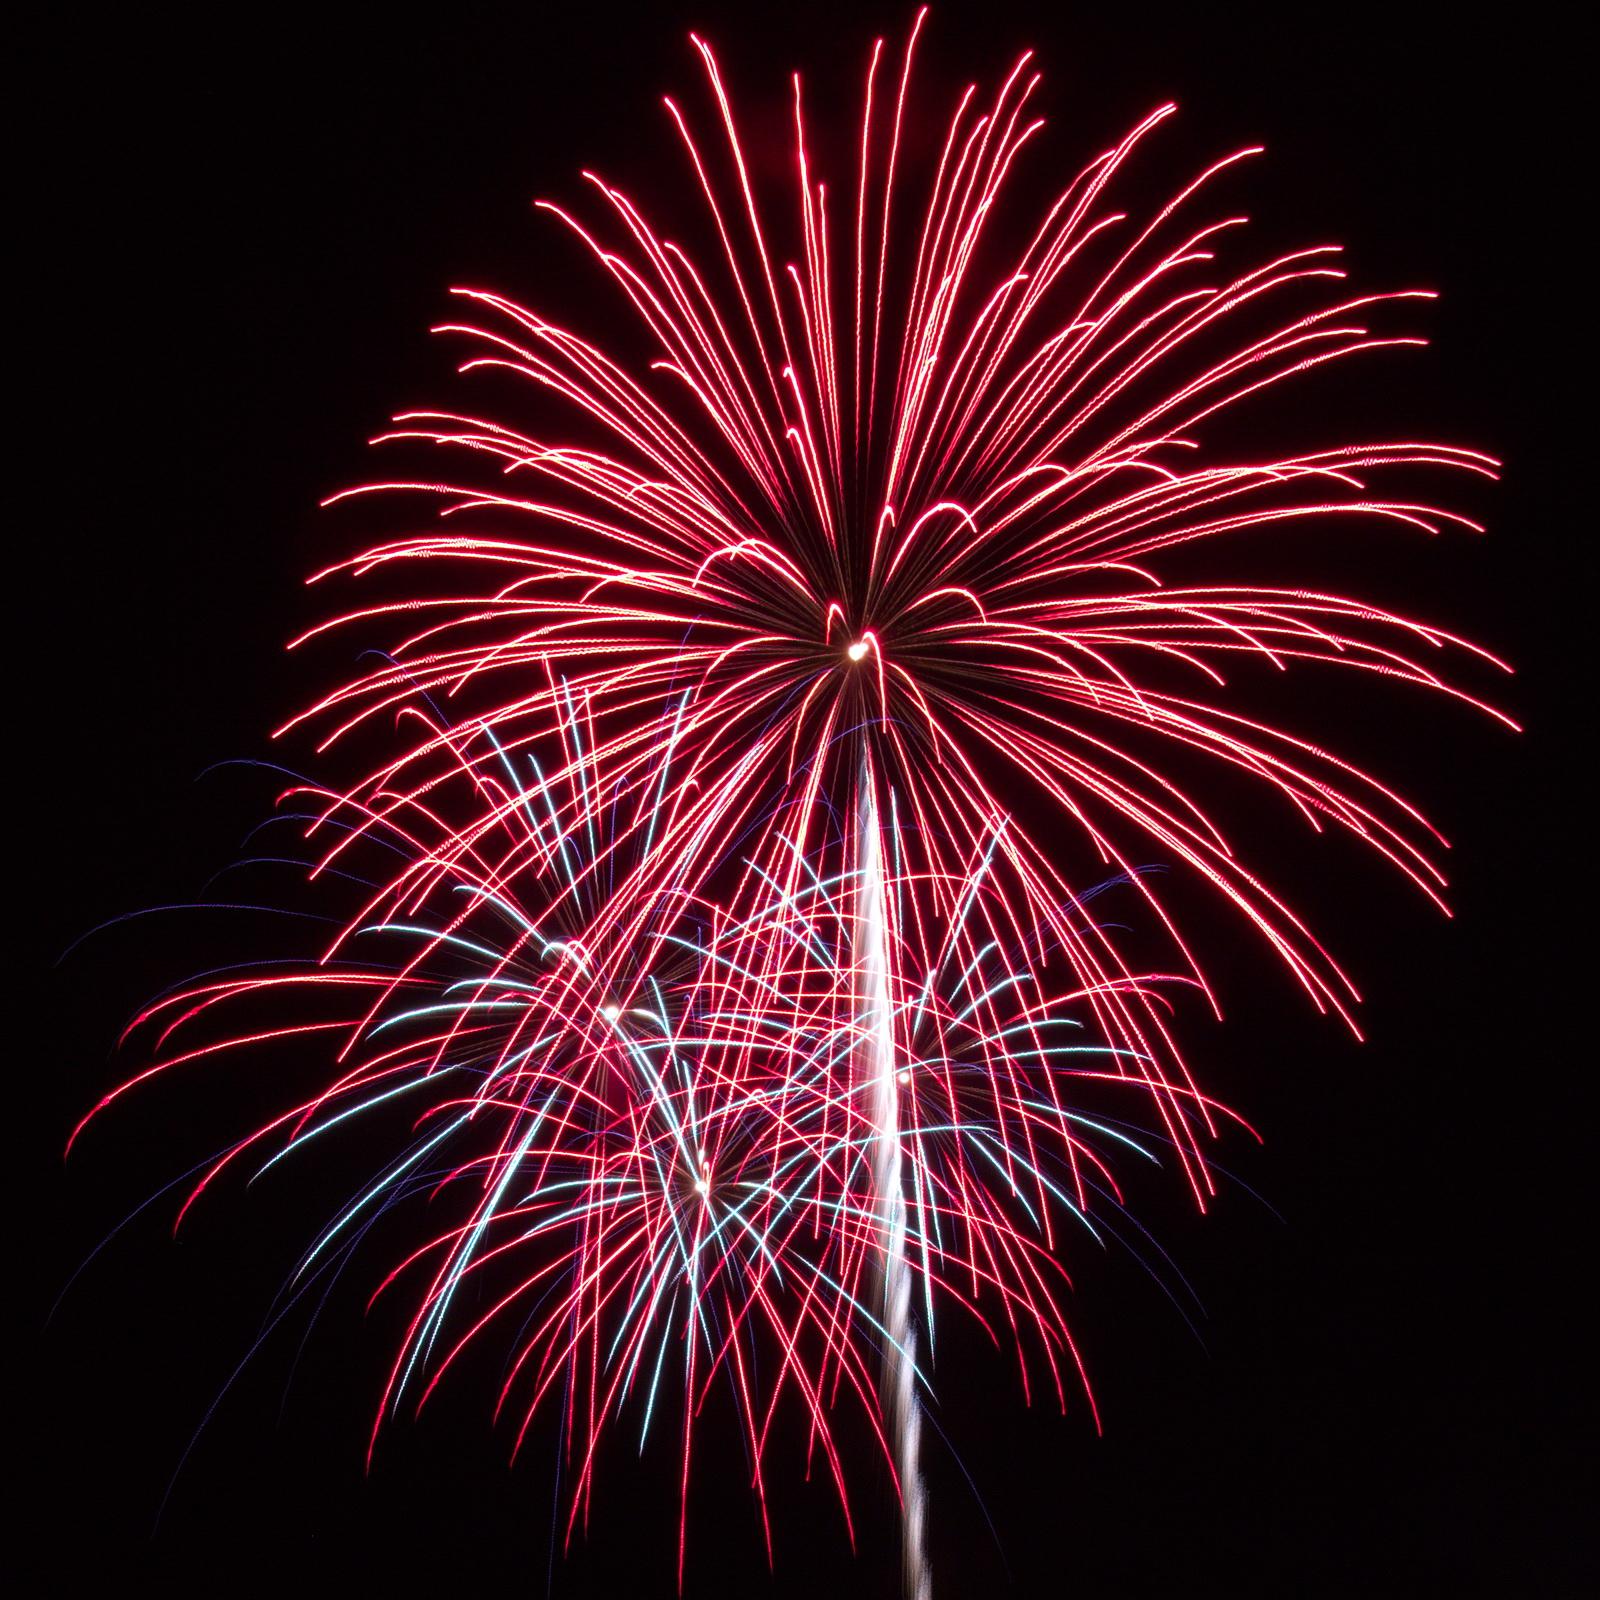 Massachusetts Fireworks: Red on red show